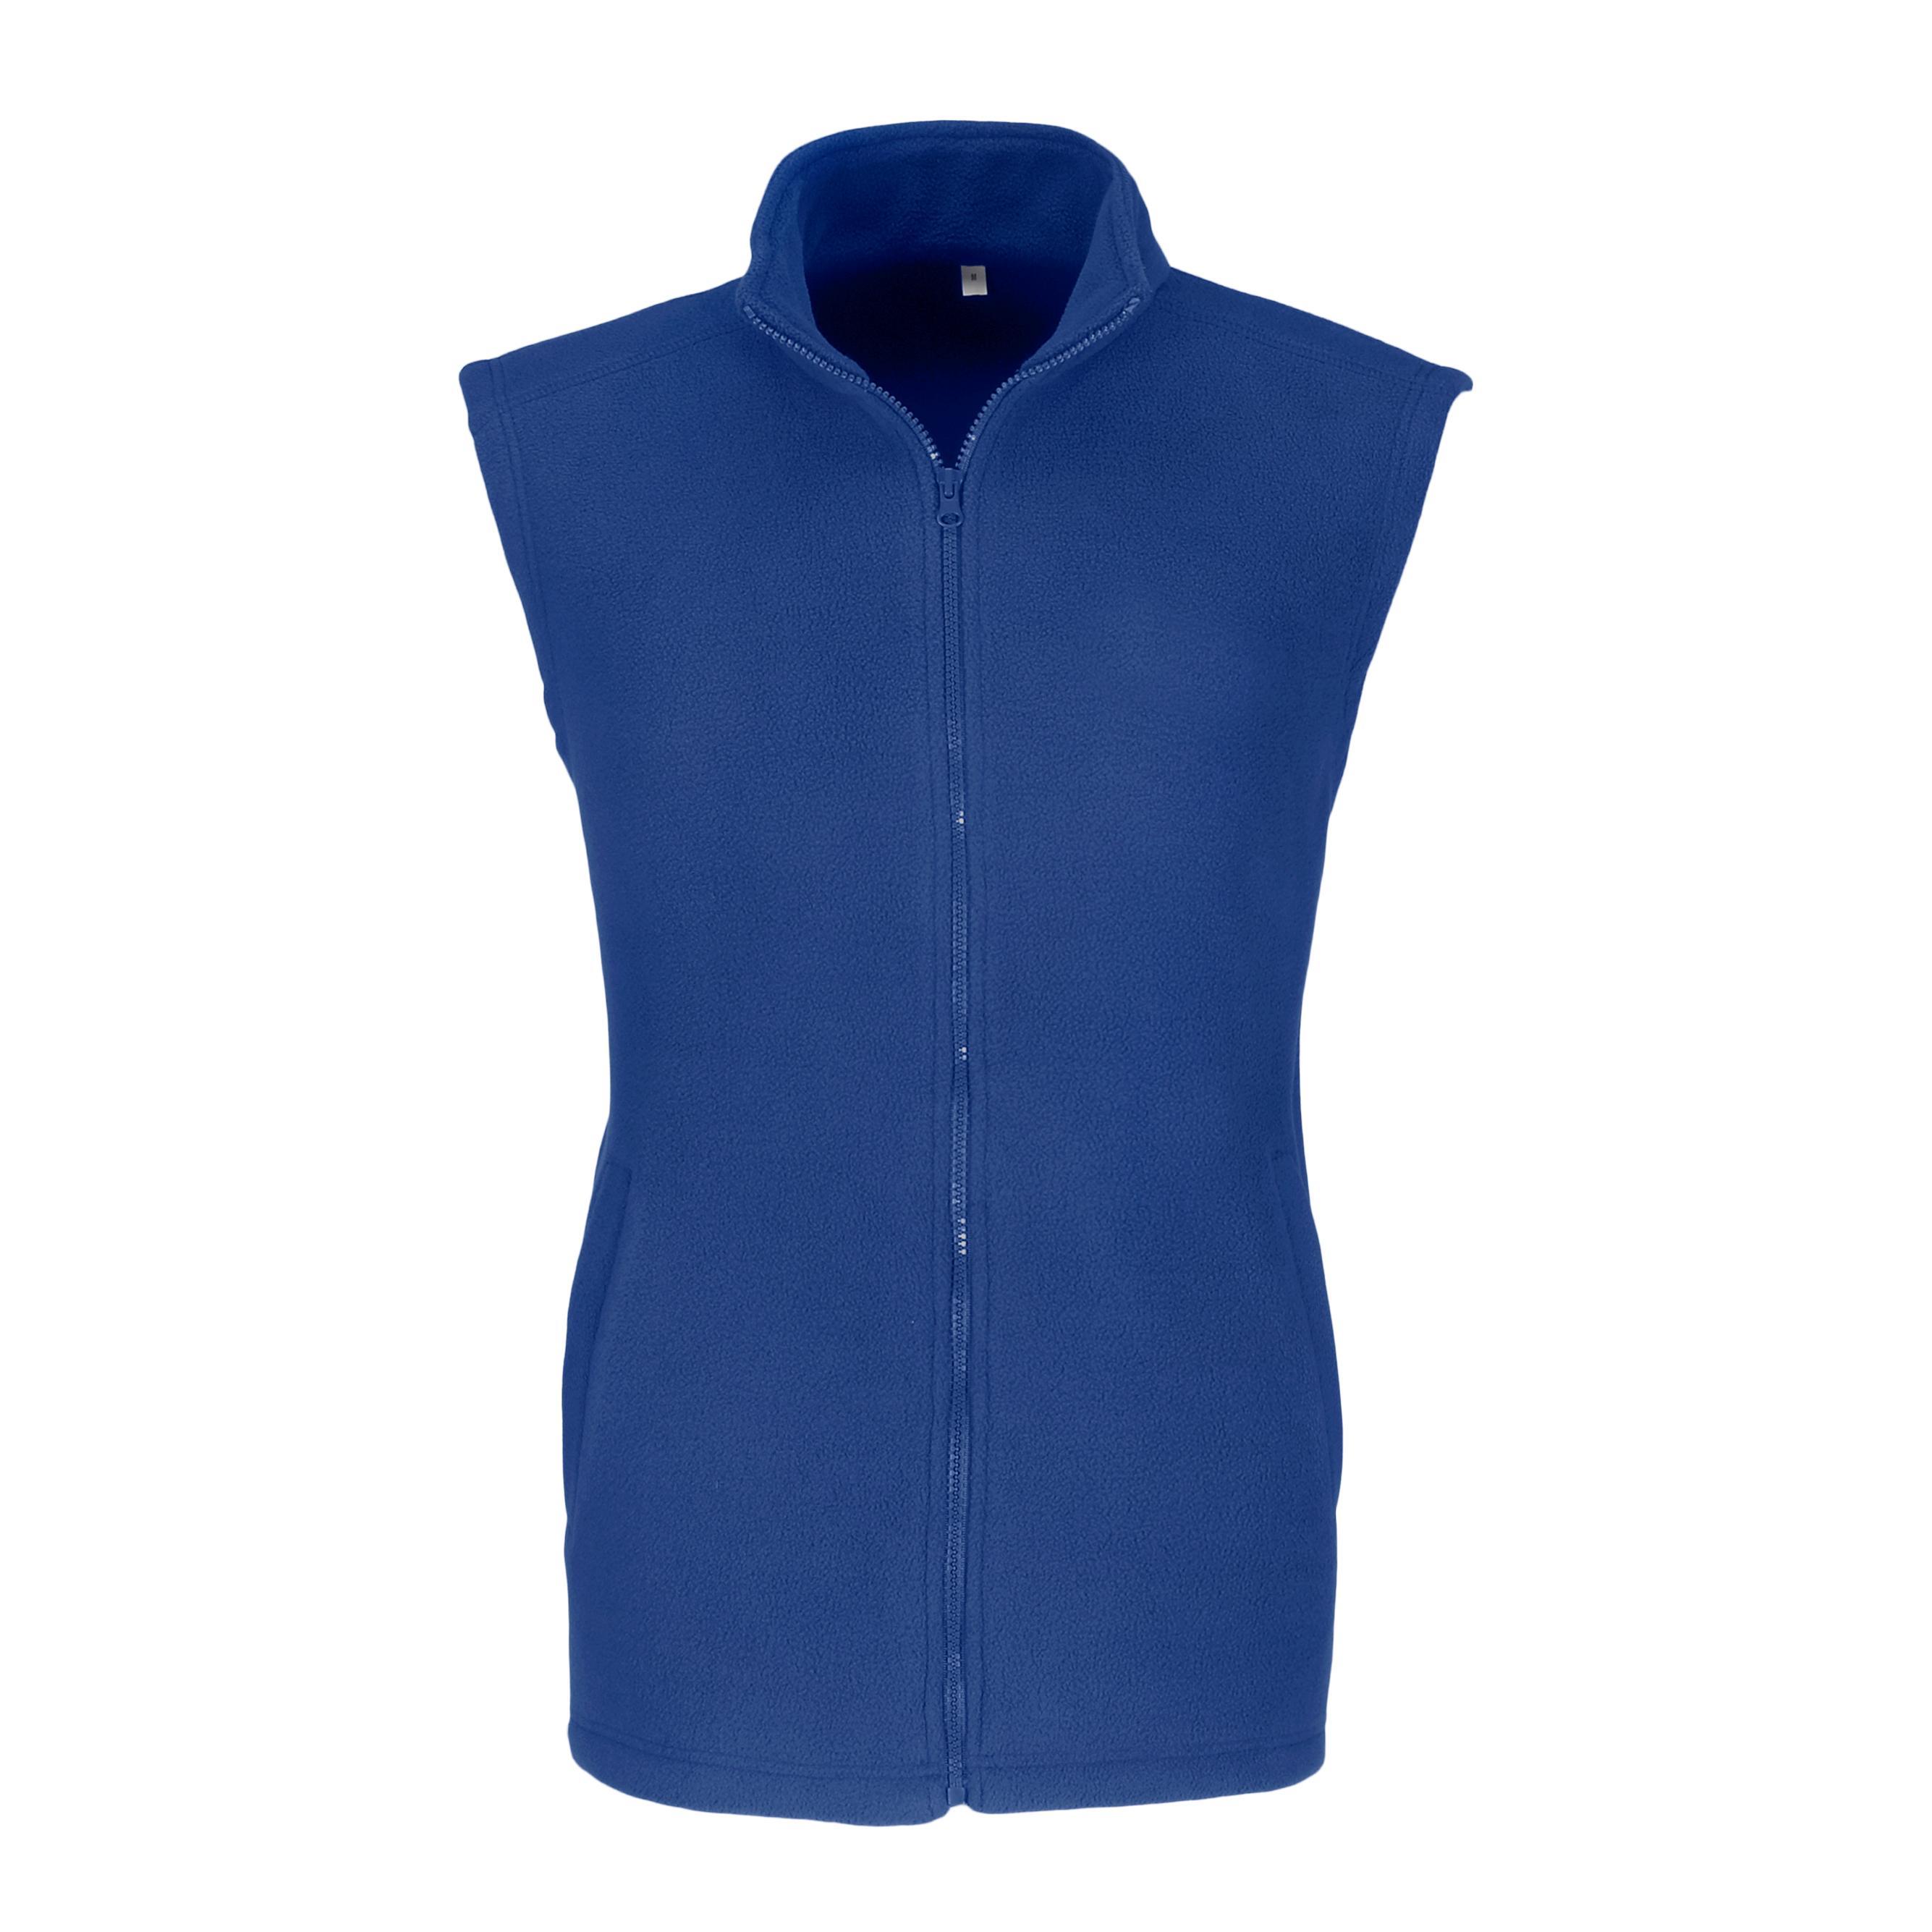 Mens Yukon Micro Fleece Bodywarmer - Blue Only